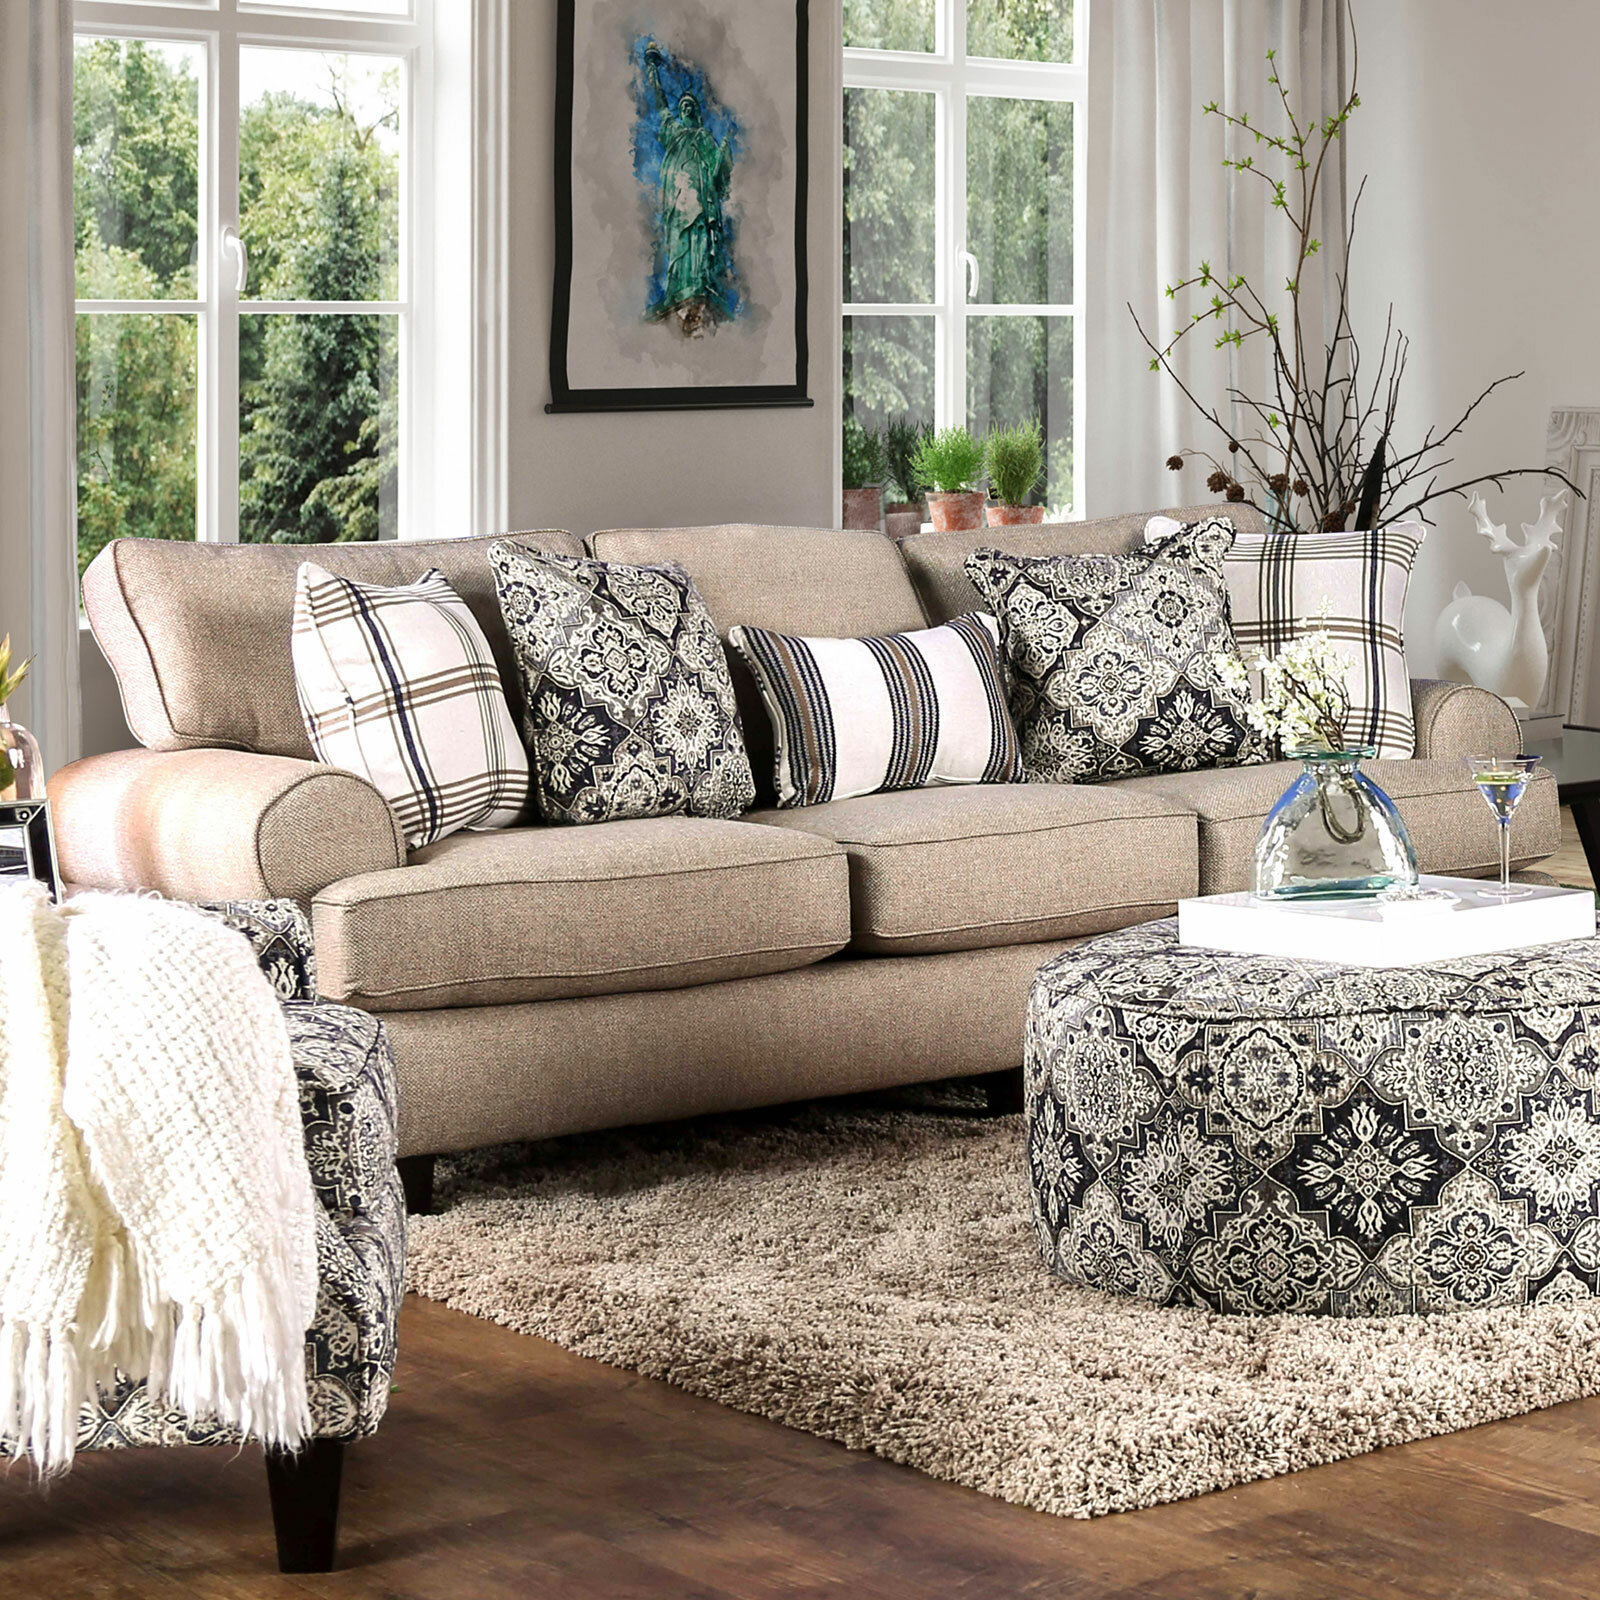 Darby Home Co Harney 88 Rolled Arm Sofa Wayfair